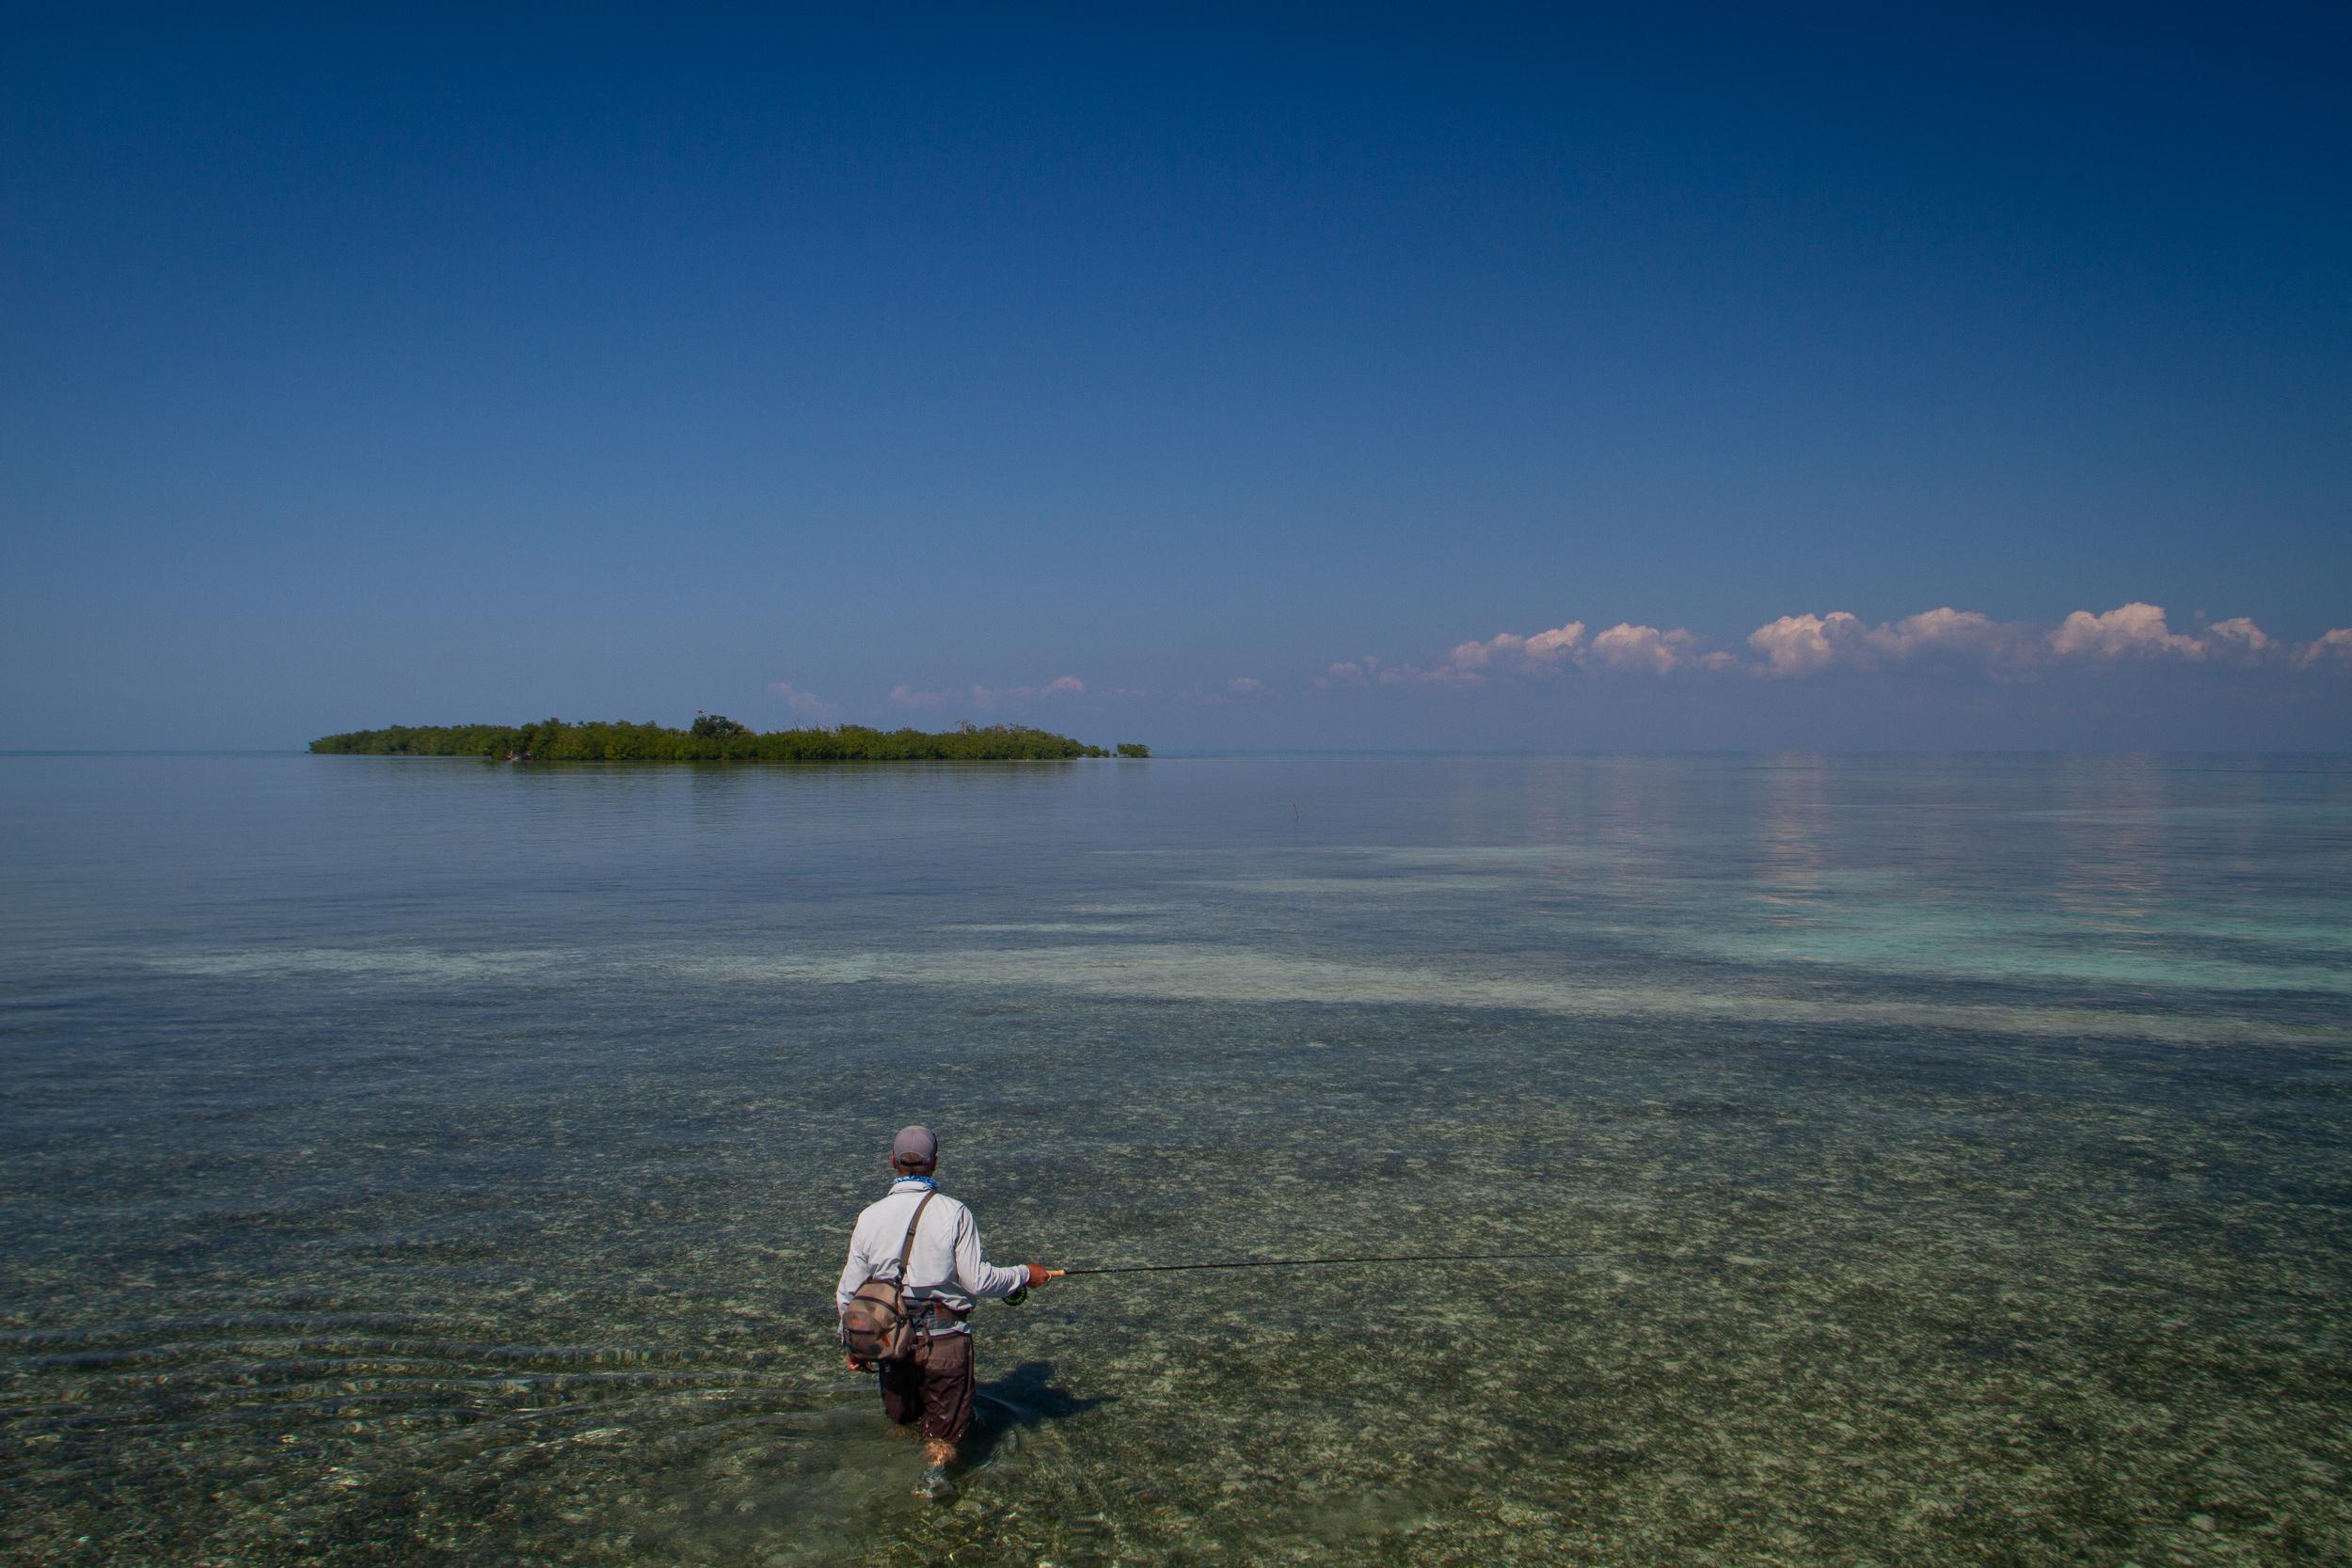 Fly Fishing for Permit, Jardines de la Reina, Cuba